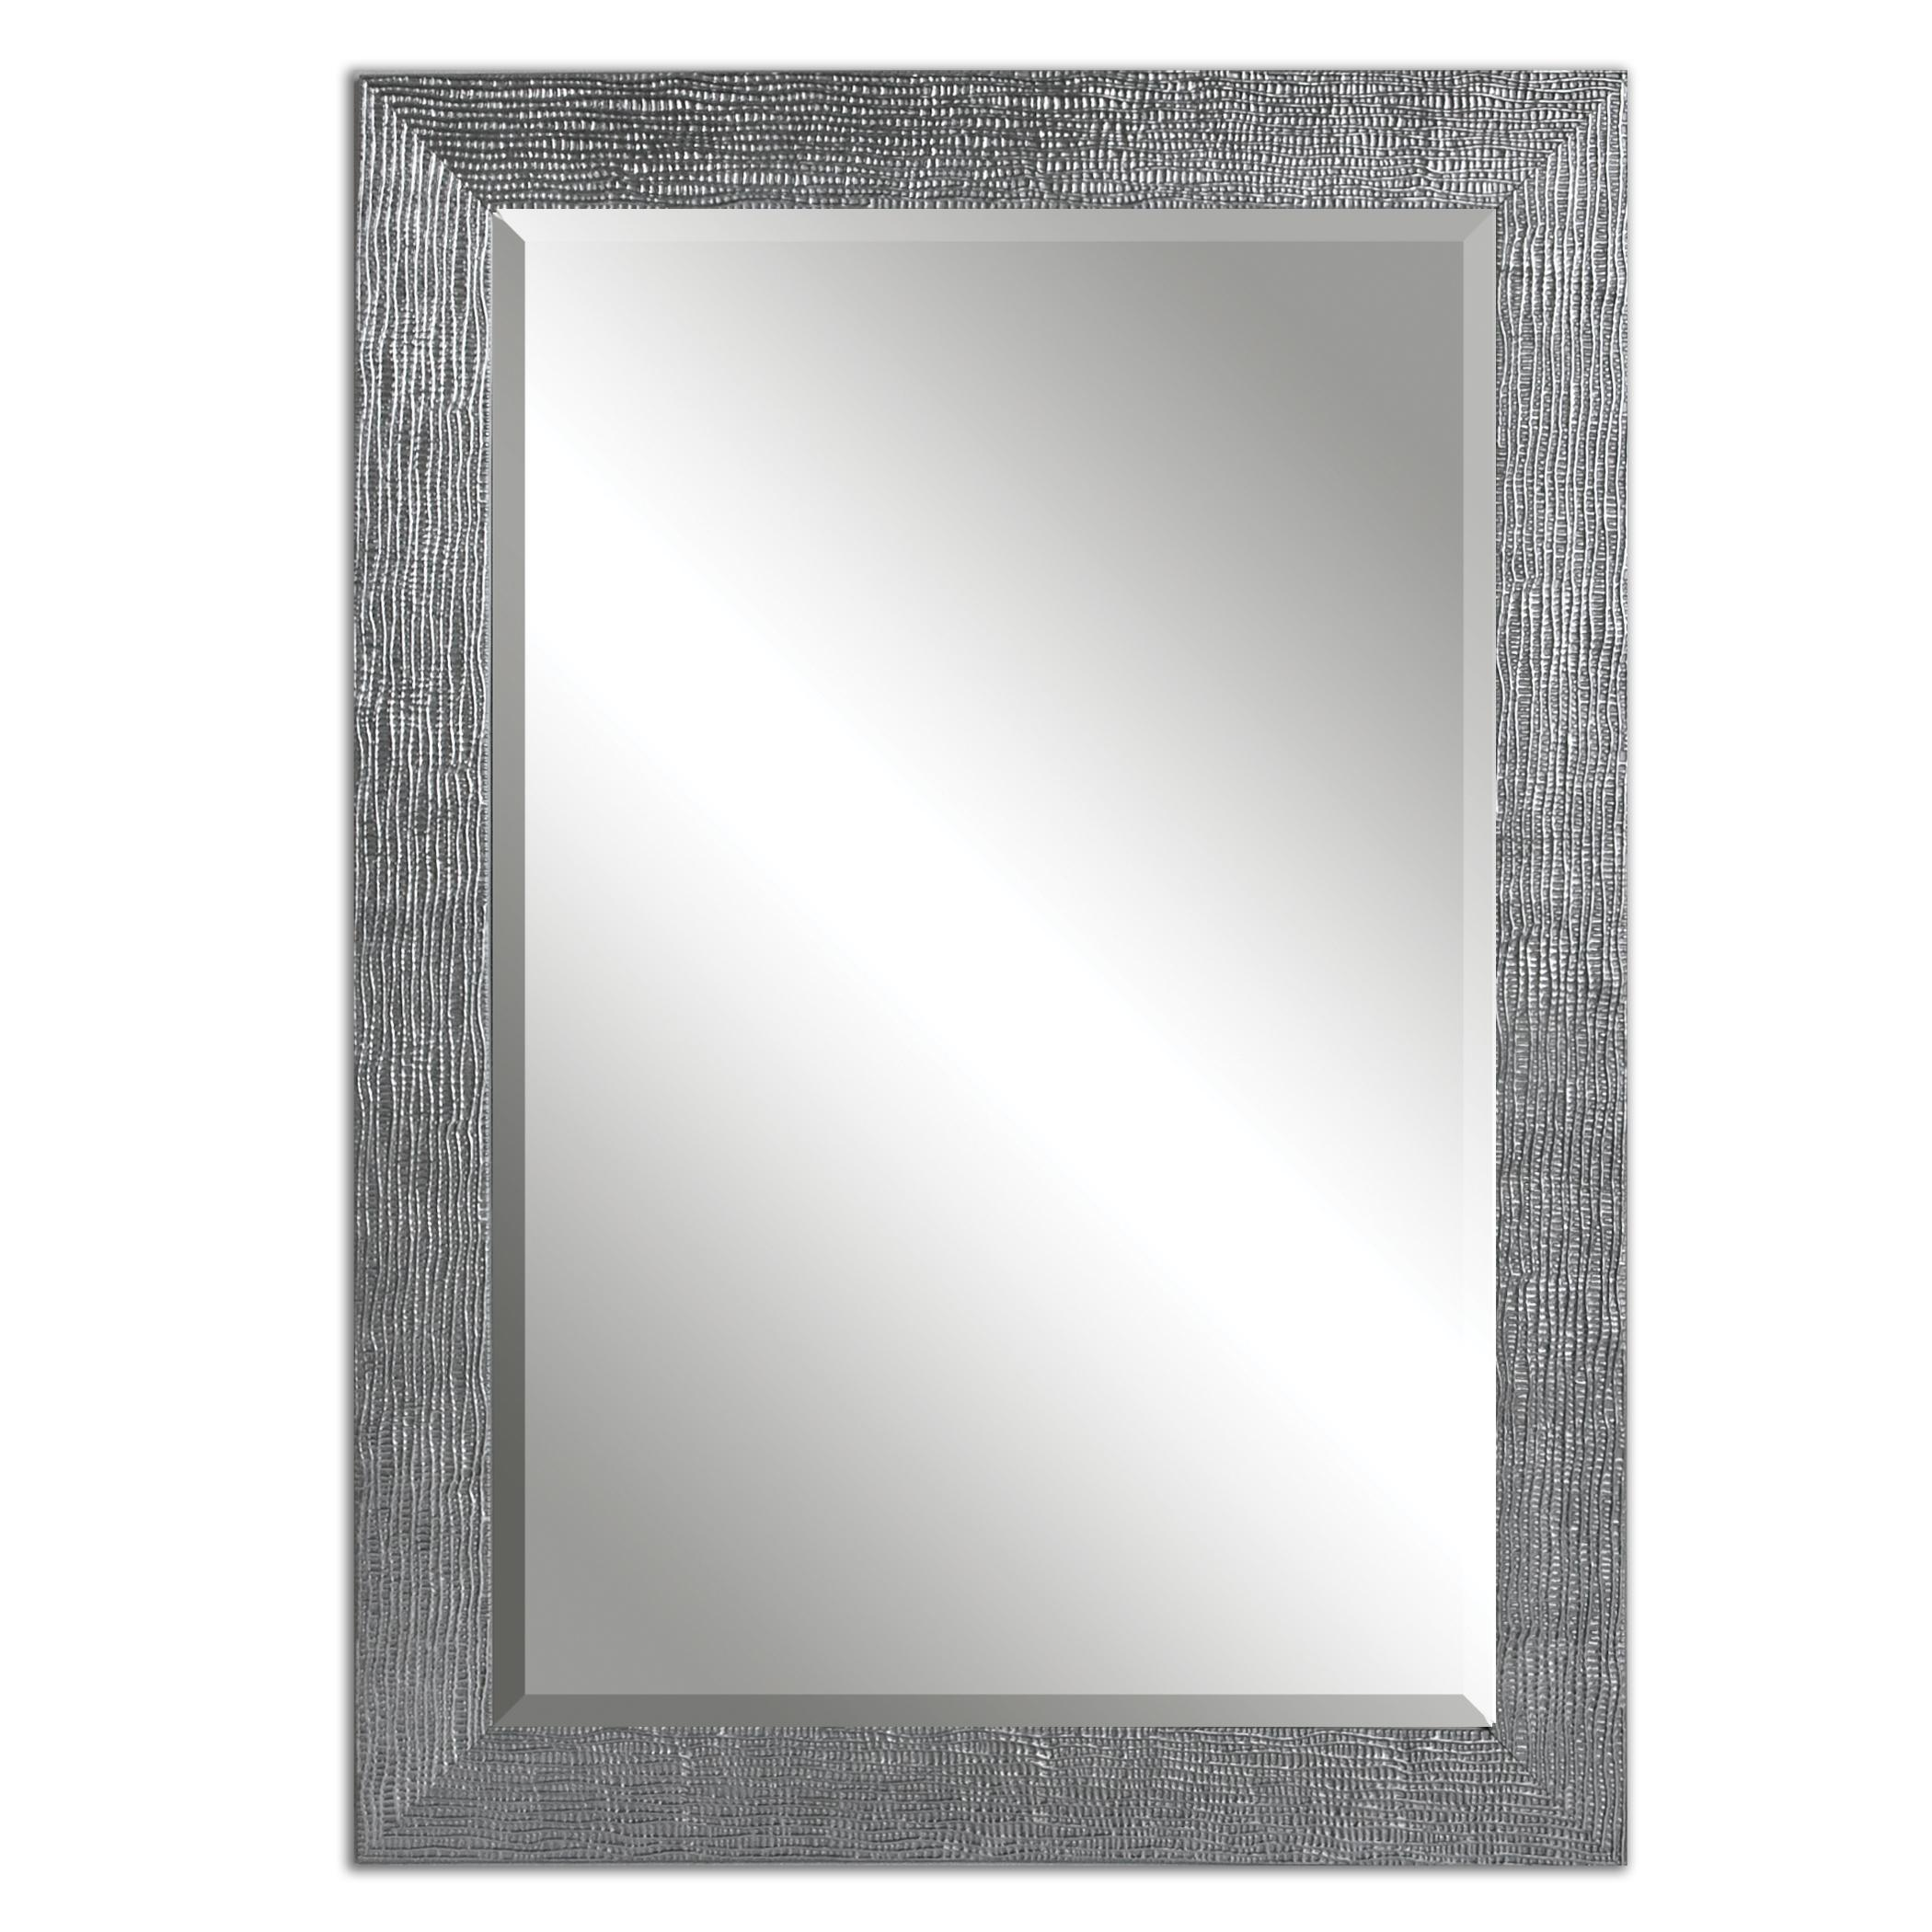 Mirrors Tarek Silver Mirror by Uttermost at Darvin Furniture